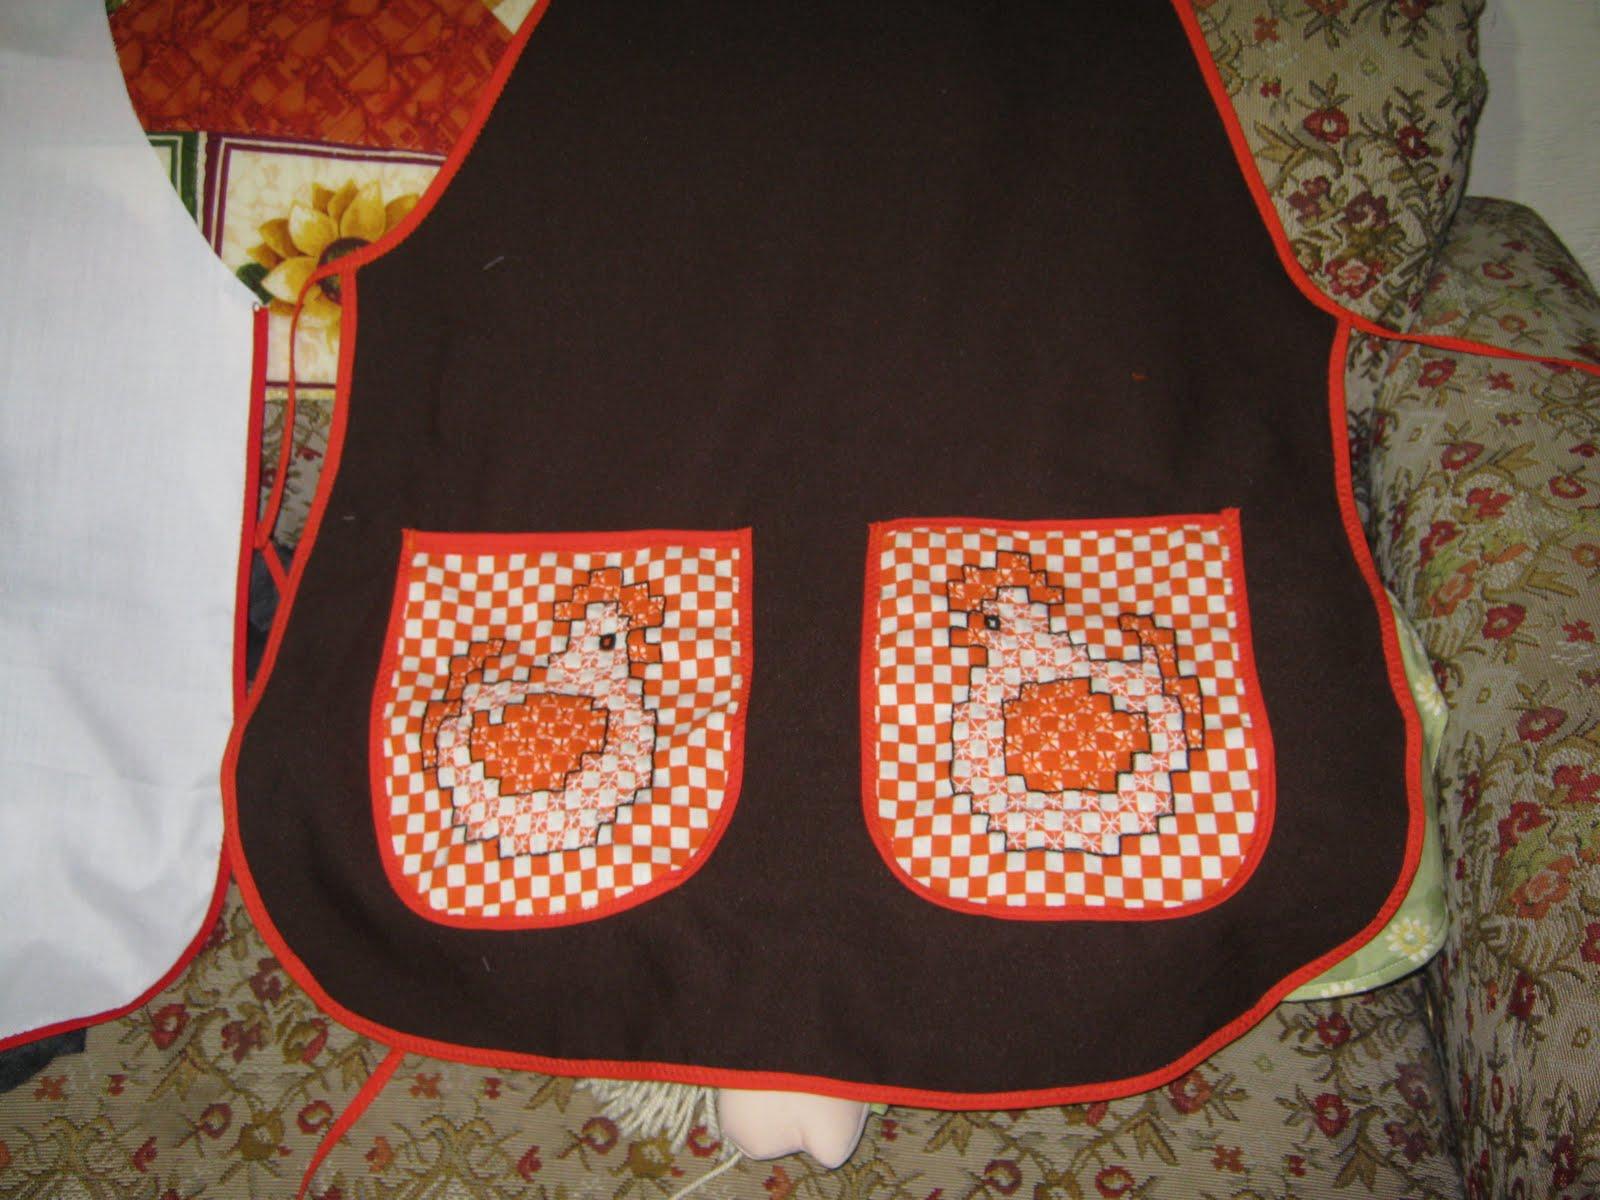 Manualidades y artesanias Salticoz: bordado español